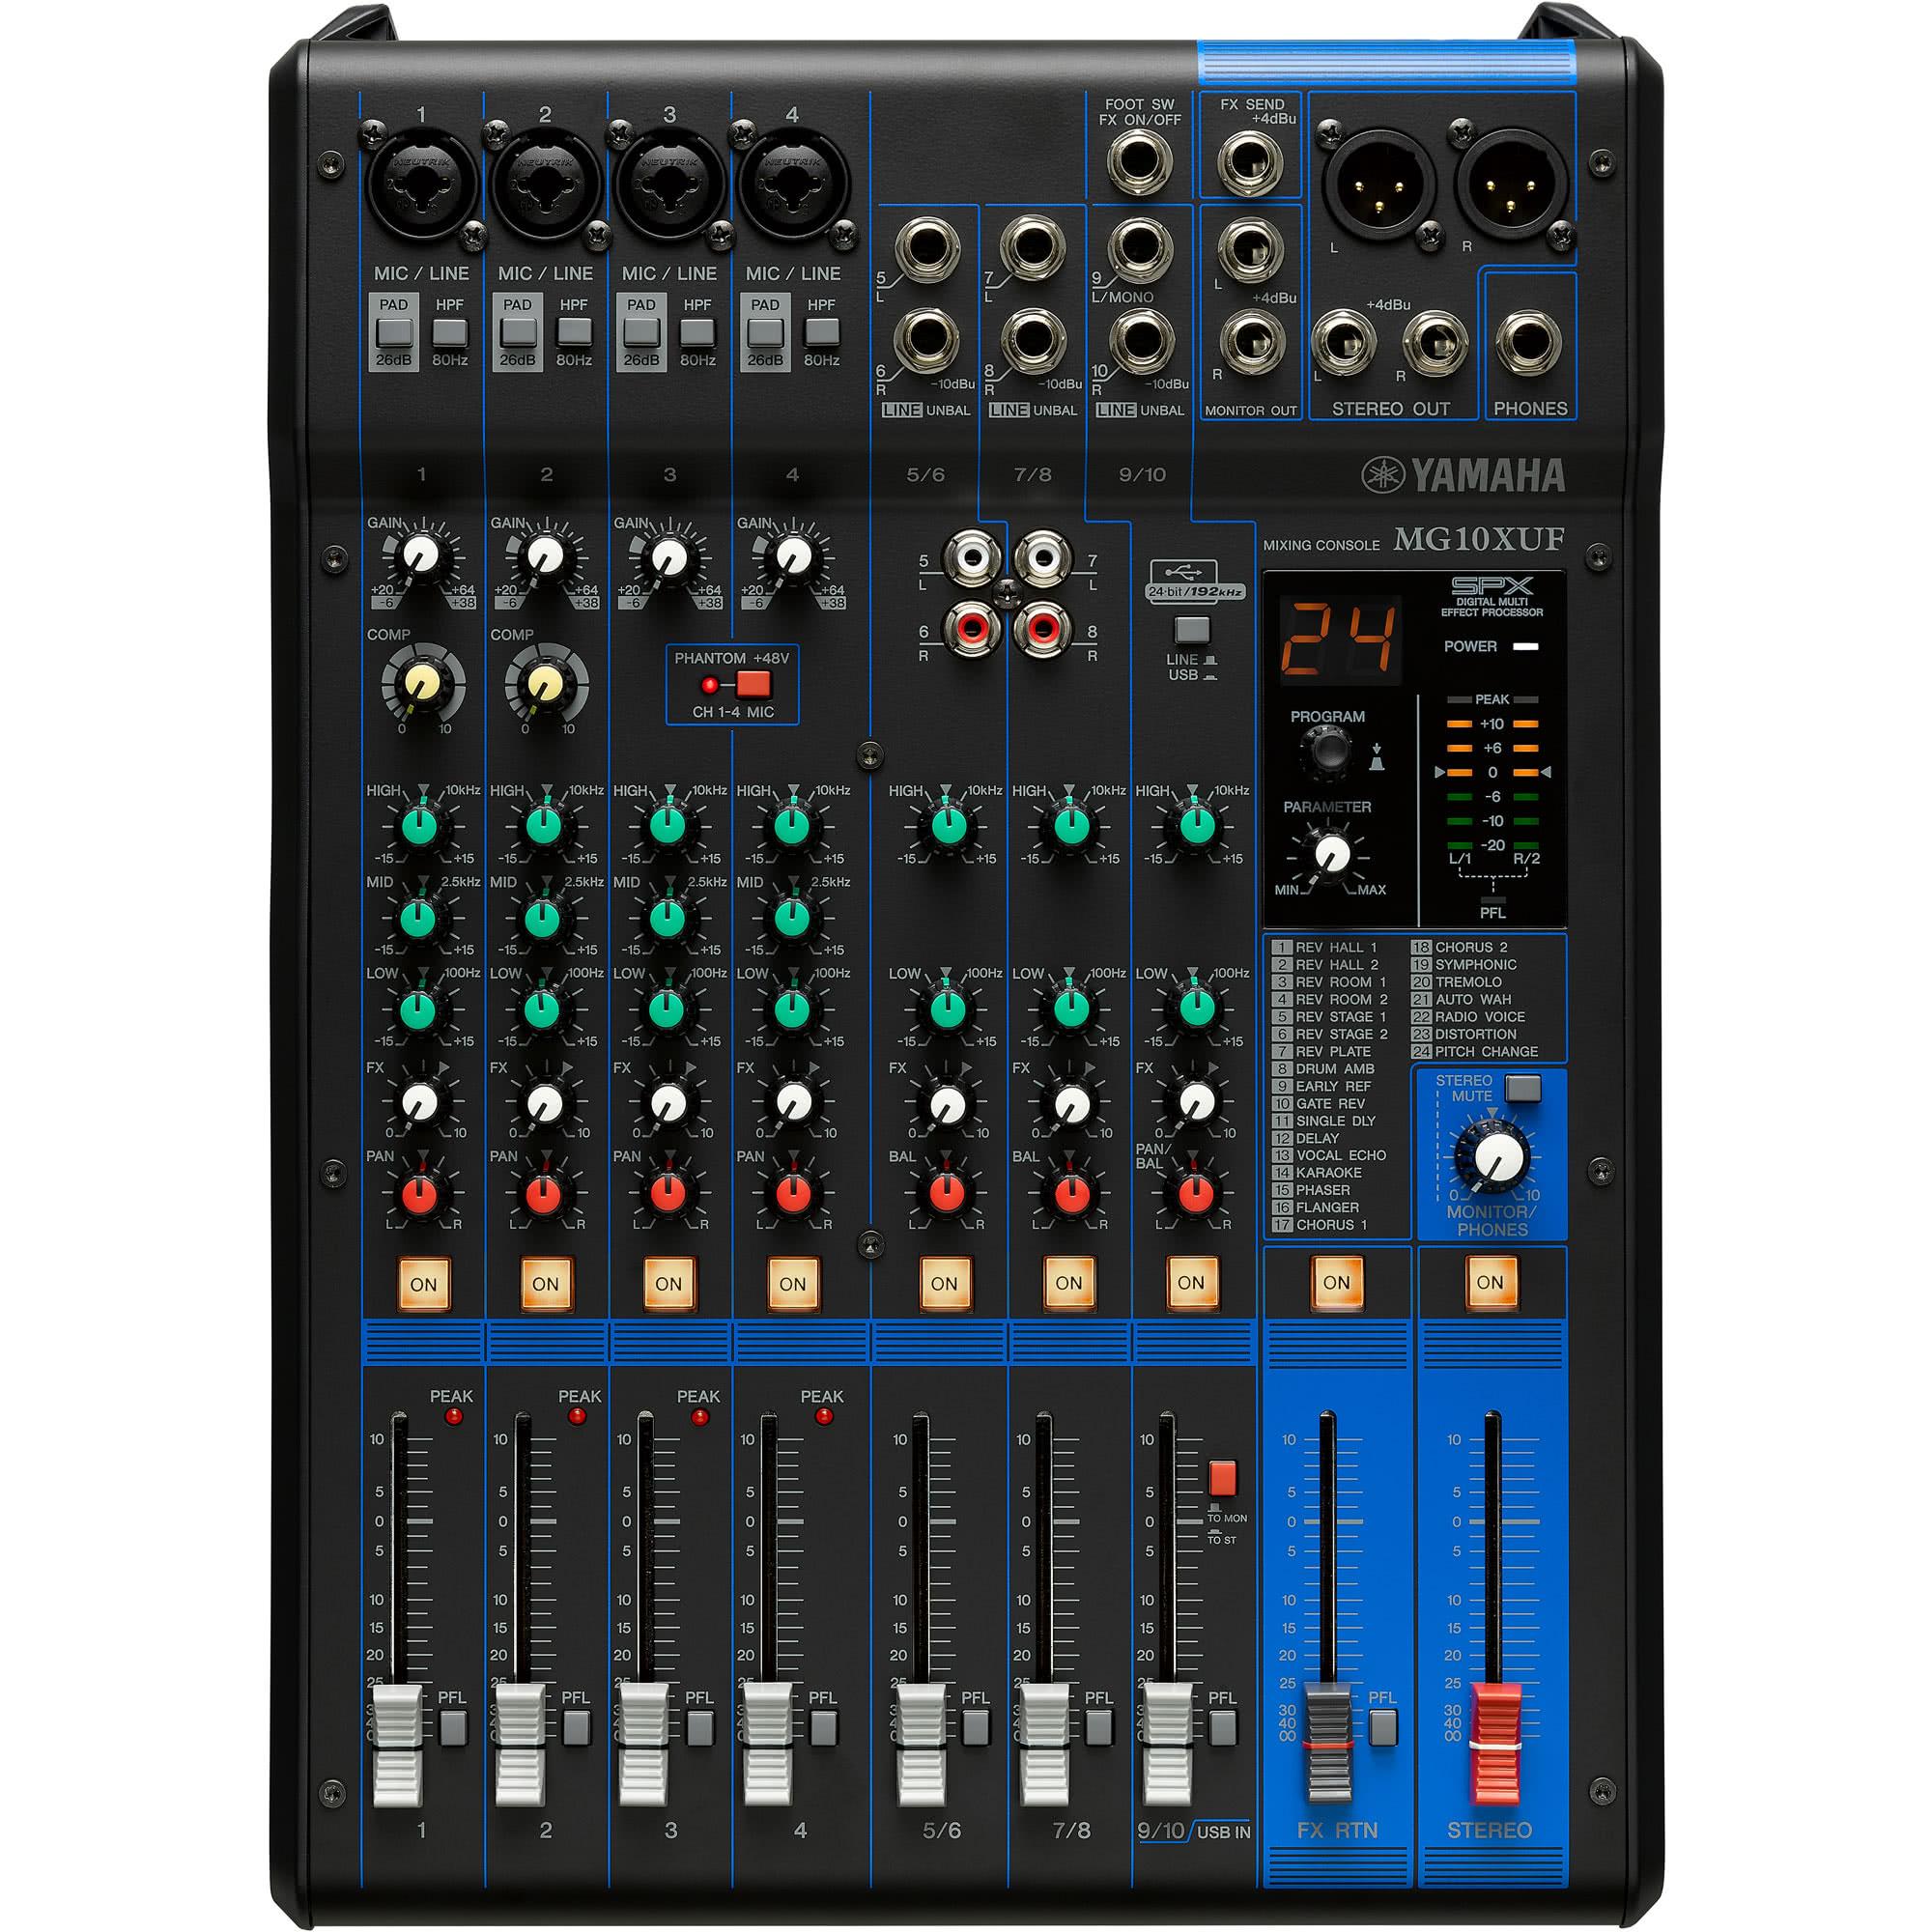 Yamaha Mg 10xuf Mixers Up To 20 Channels Studio Mixers